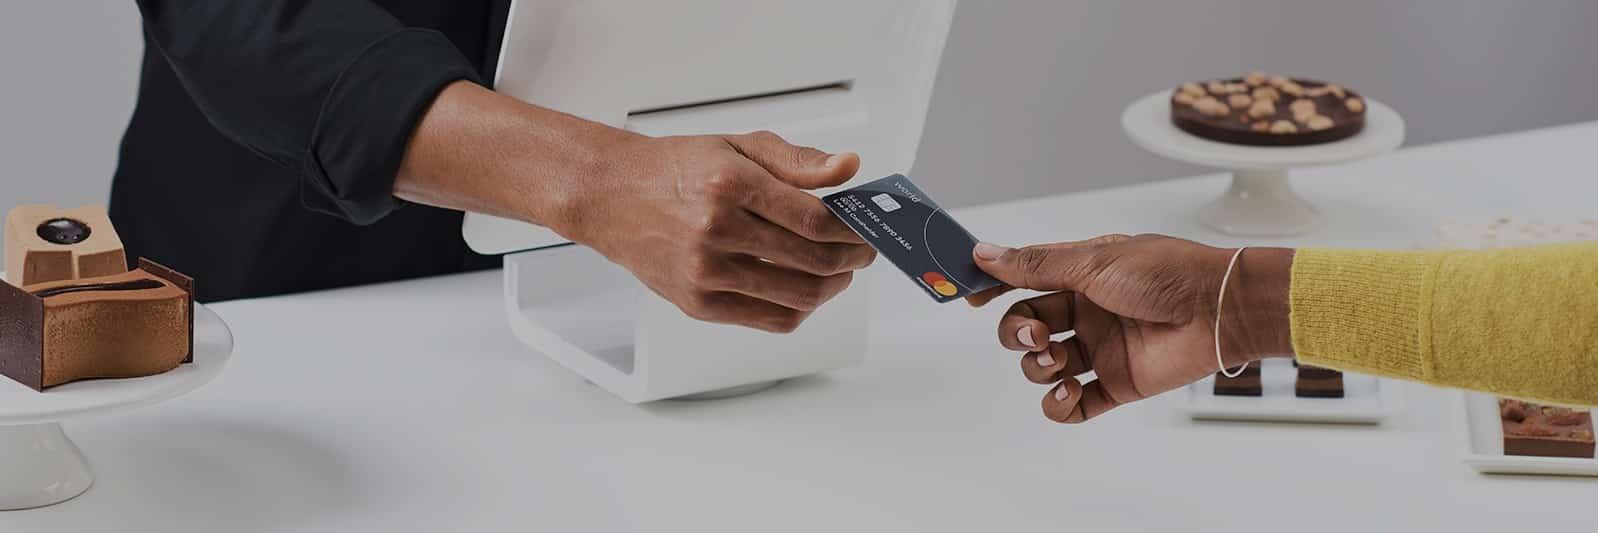 MasterCard Nigeria Recruitment 2021/2022 Application Forms Portal